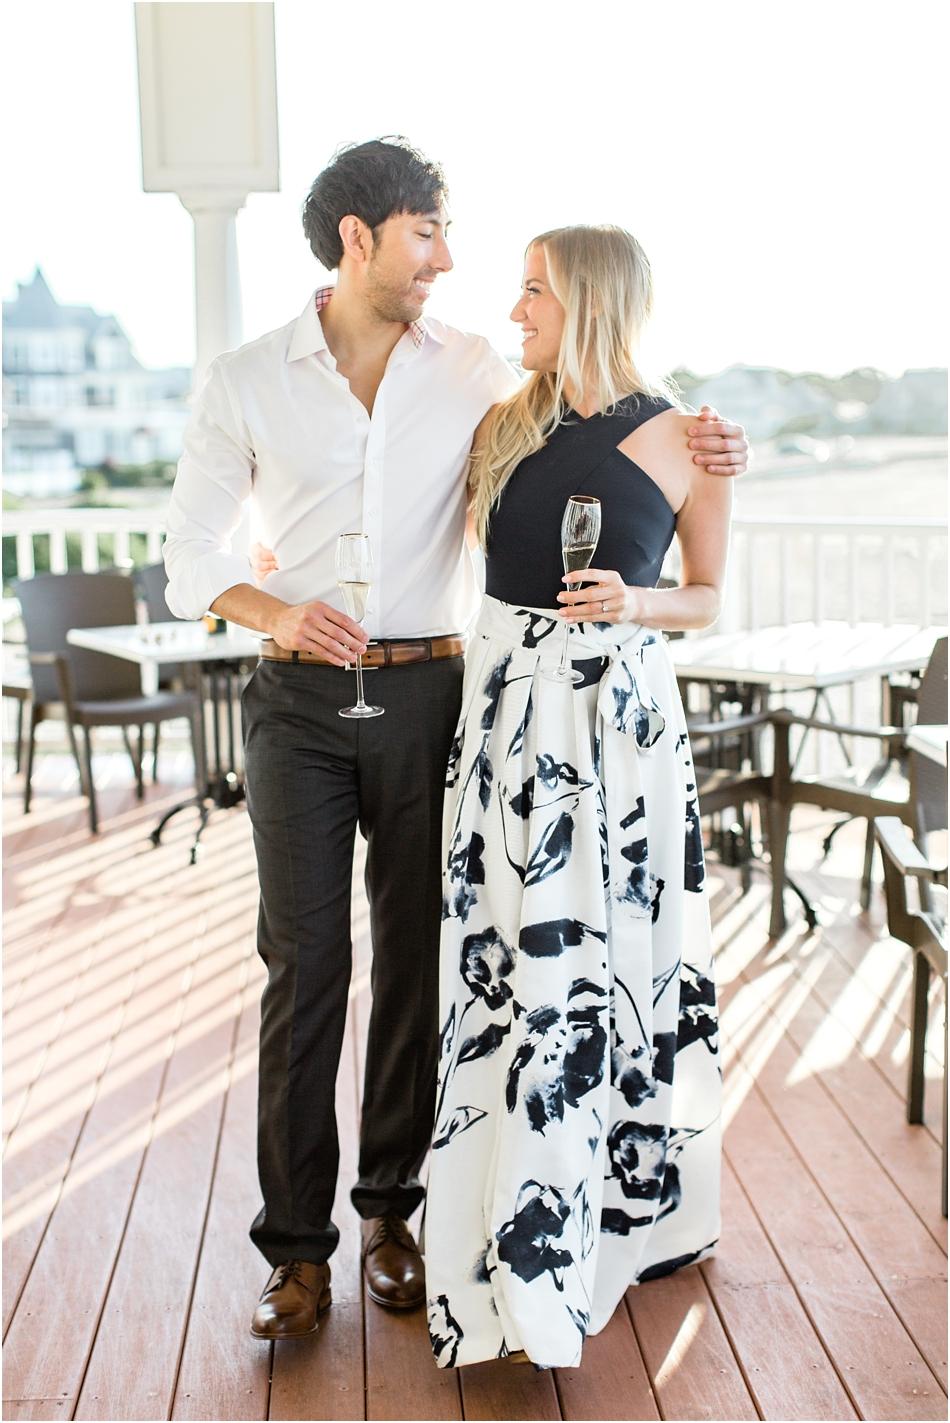 falmouth_beach_engagement_green_pond_boston_massachusetts_cape_cod_new_england_wedding_photographer_Meredith_Jane_Photography_photo_1645.jpg